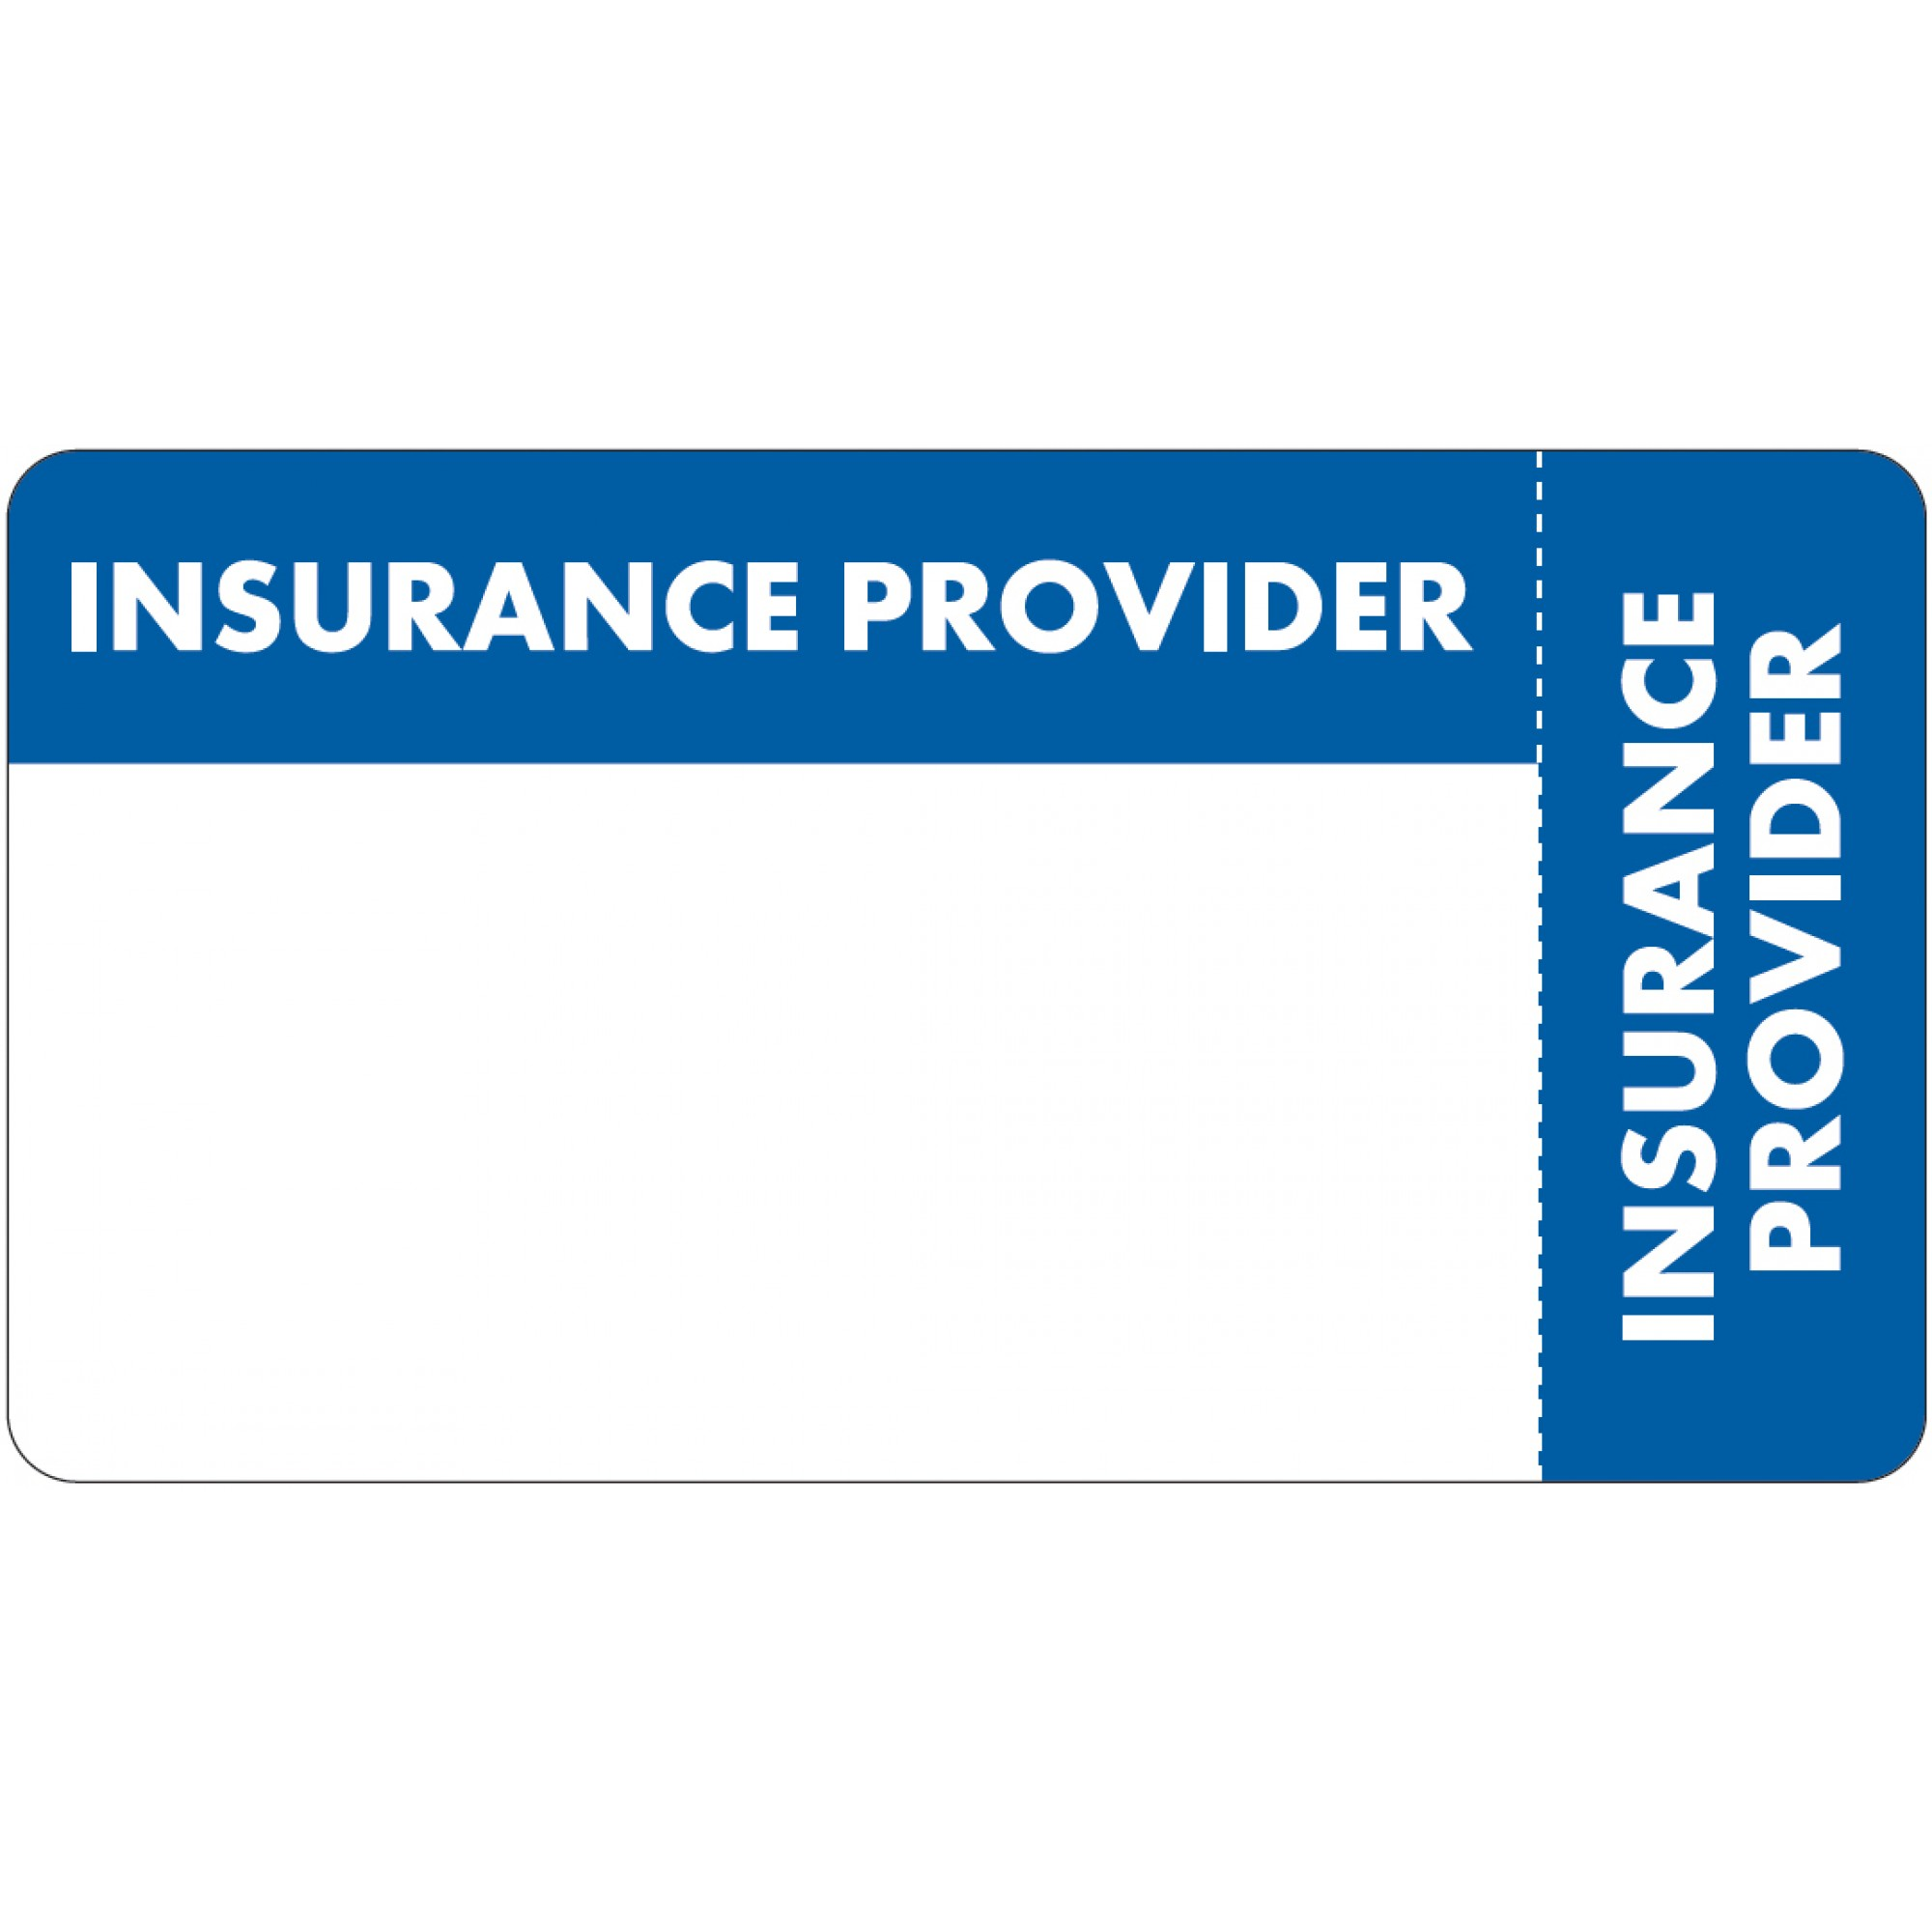 insurance provider photo - 1